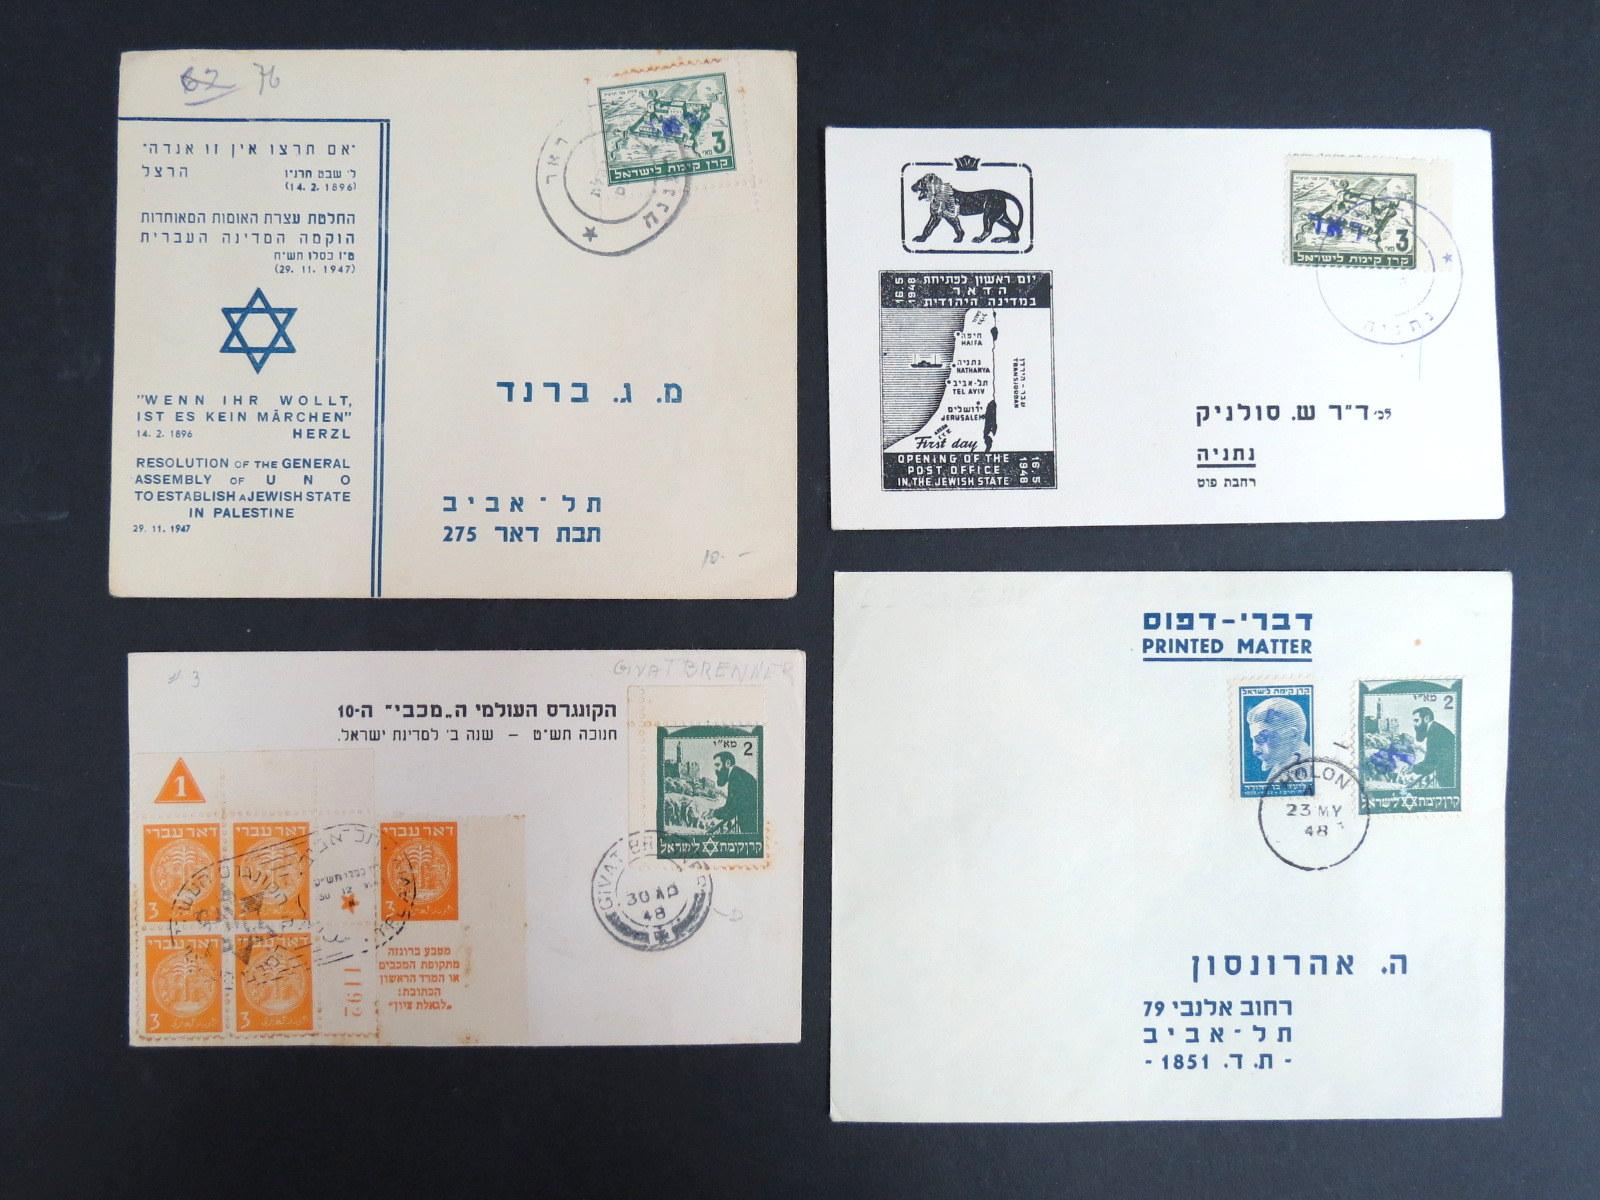 1948 INTERIM lot of 4 philatelic M. Ha'am covers: a. Natanya M. Ha'am pmk, franked 3 mils b. Raanana M. Ha'am pmk, franked 3 mils little stain c. Givat Brenner, mandate pmk 30 AP48, franked 2 mil, letter 5 stps of Doar